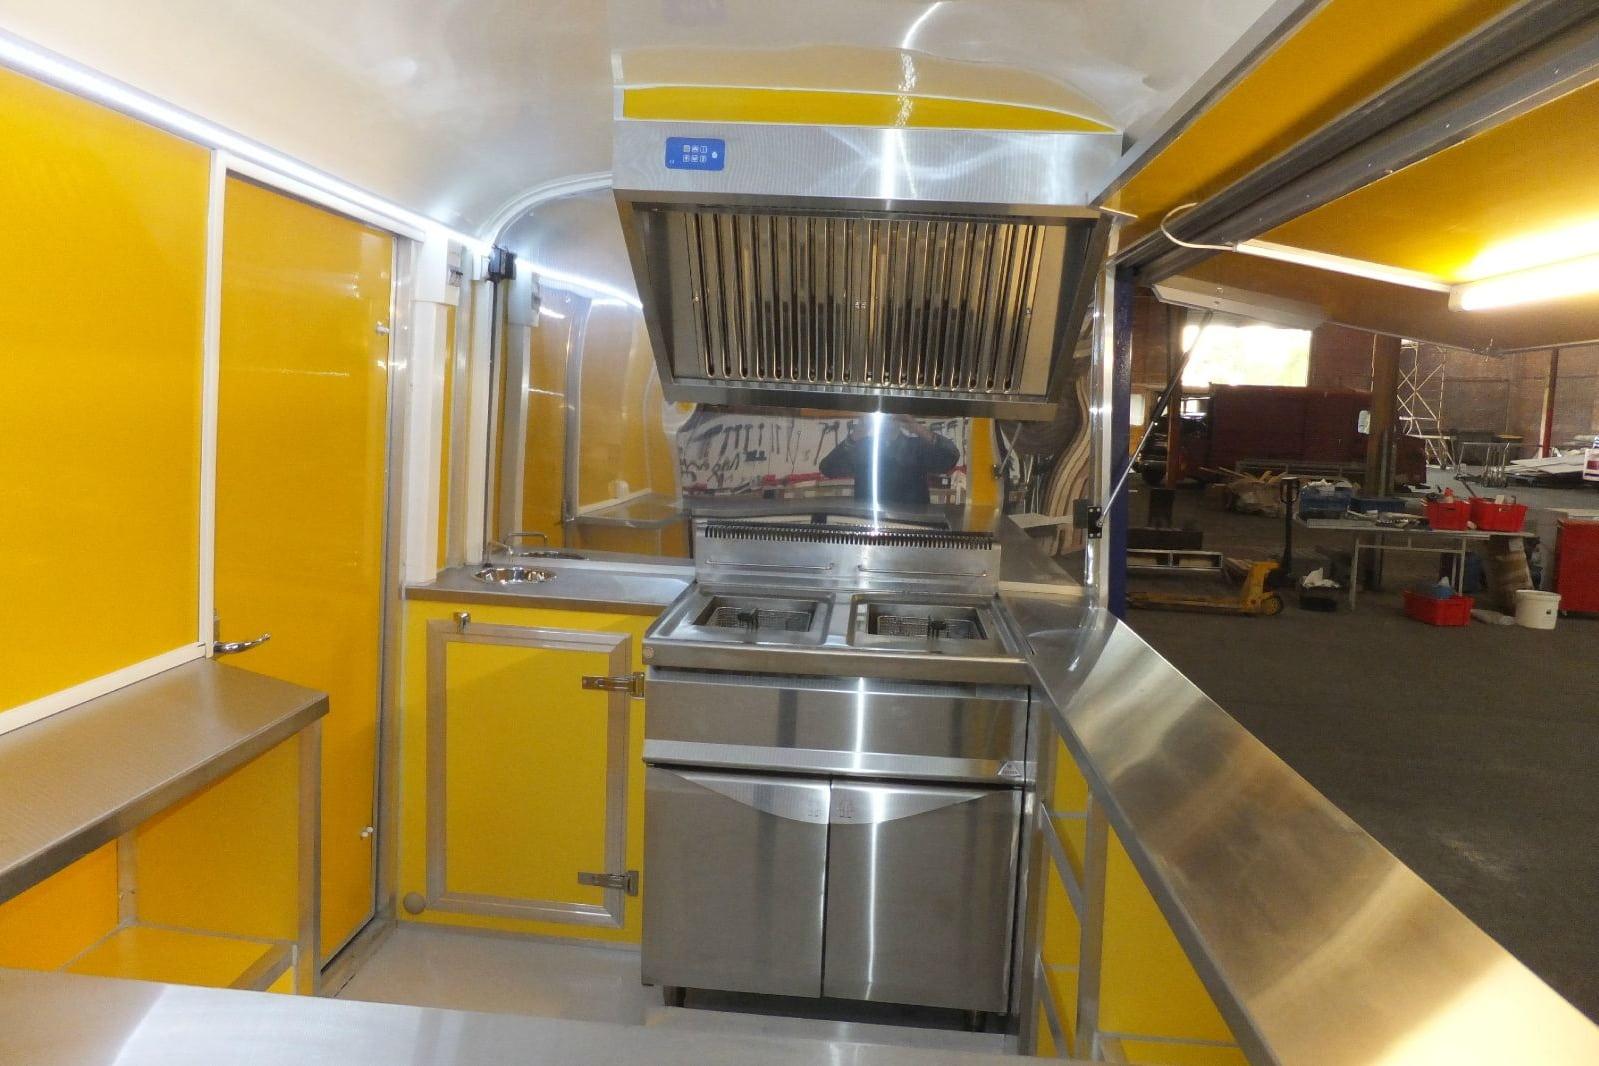 Transformation d'un HY Camping Car en Truck Food GroteFoto-SZKZKUC4